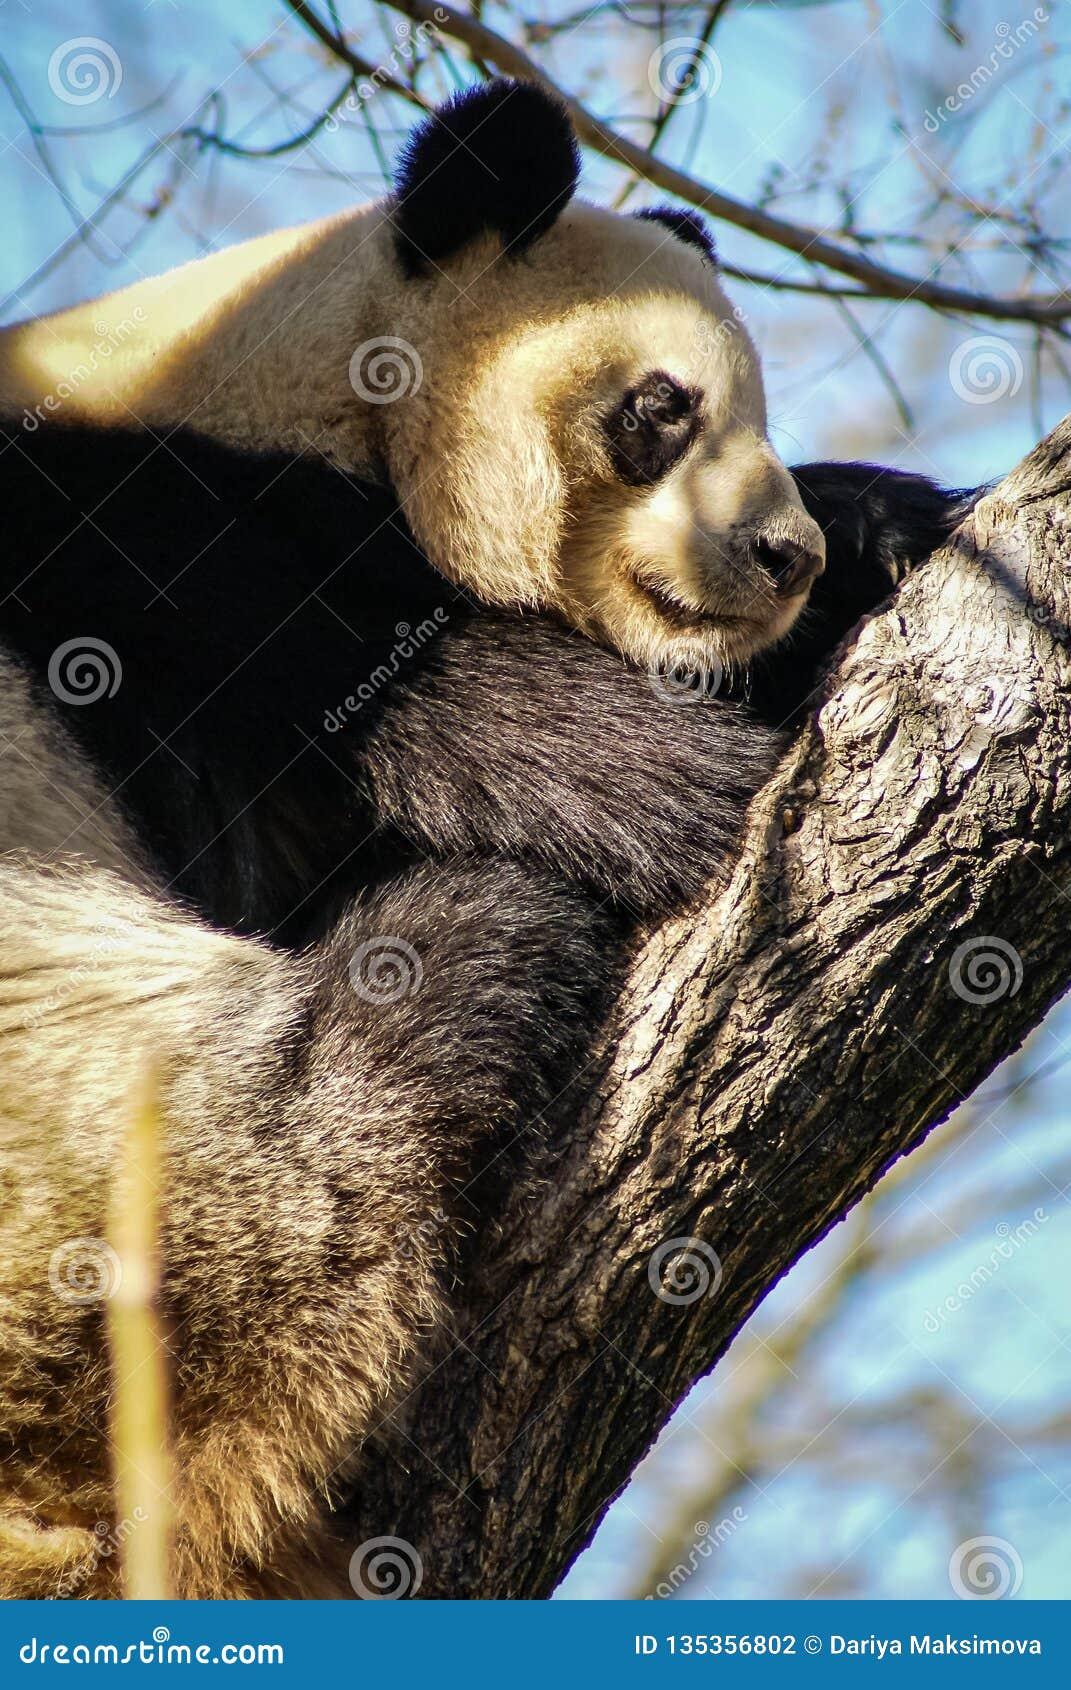 Big black and white panda bear sitting on a tree